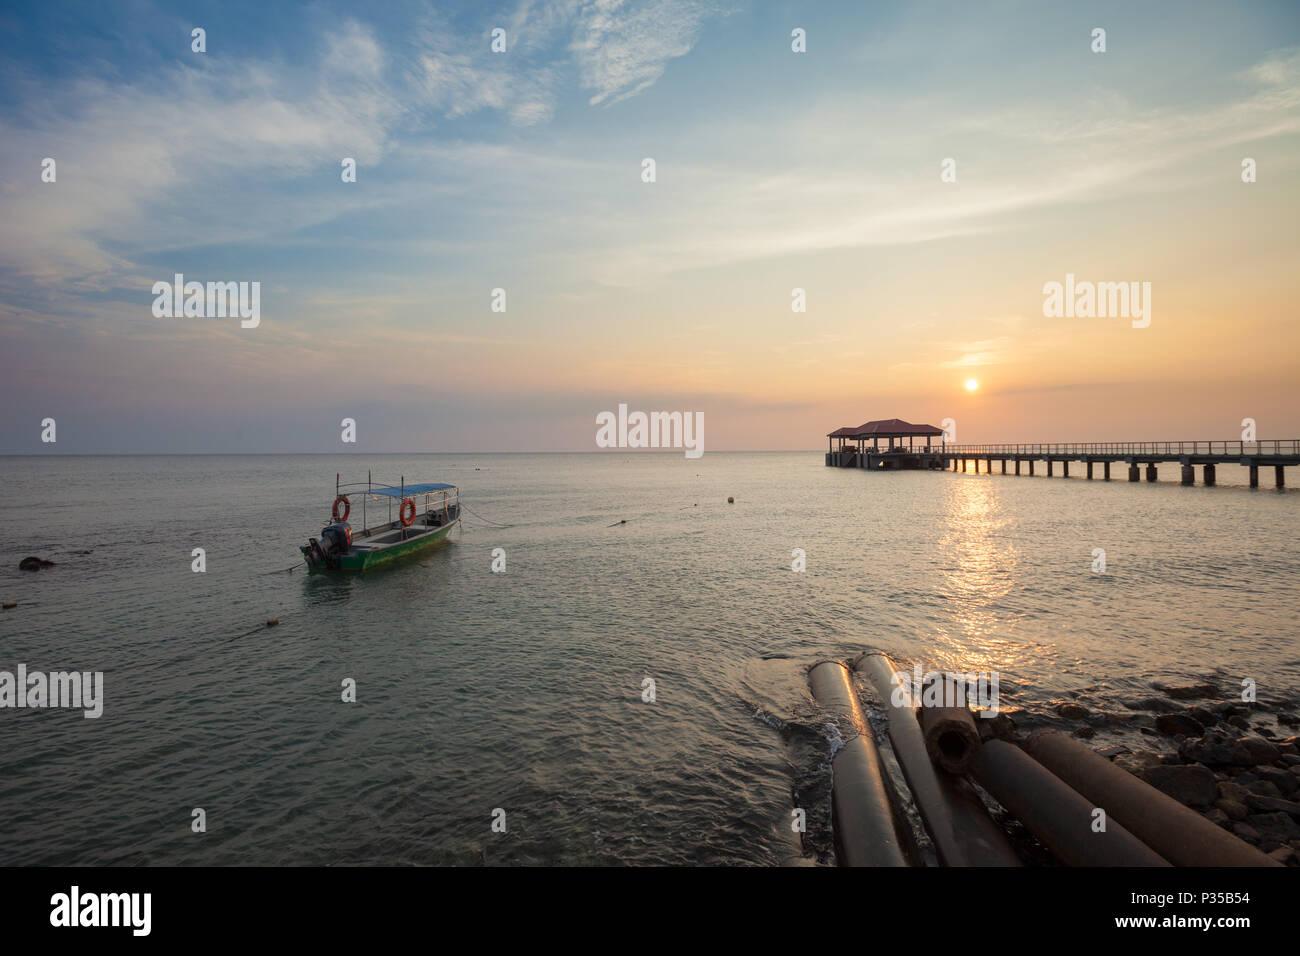 Atardecer en el aire Batang (ABC), la playa (Pulau) La isla de Tioman, Malasia Foto de stock